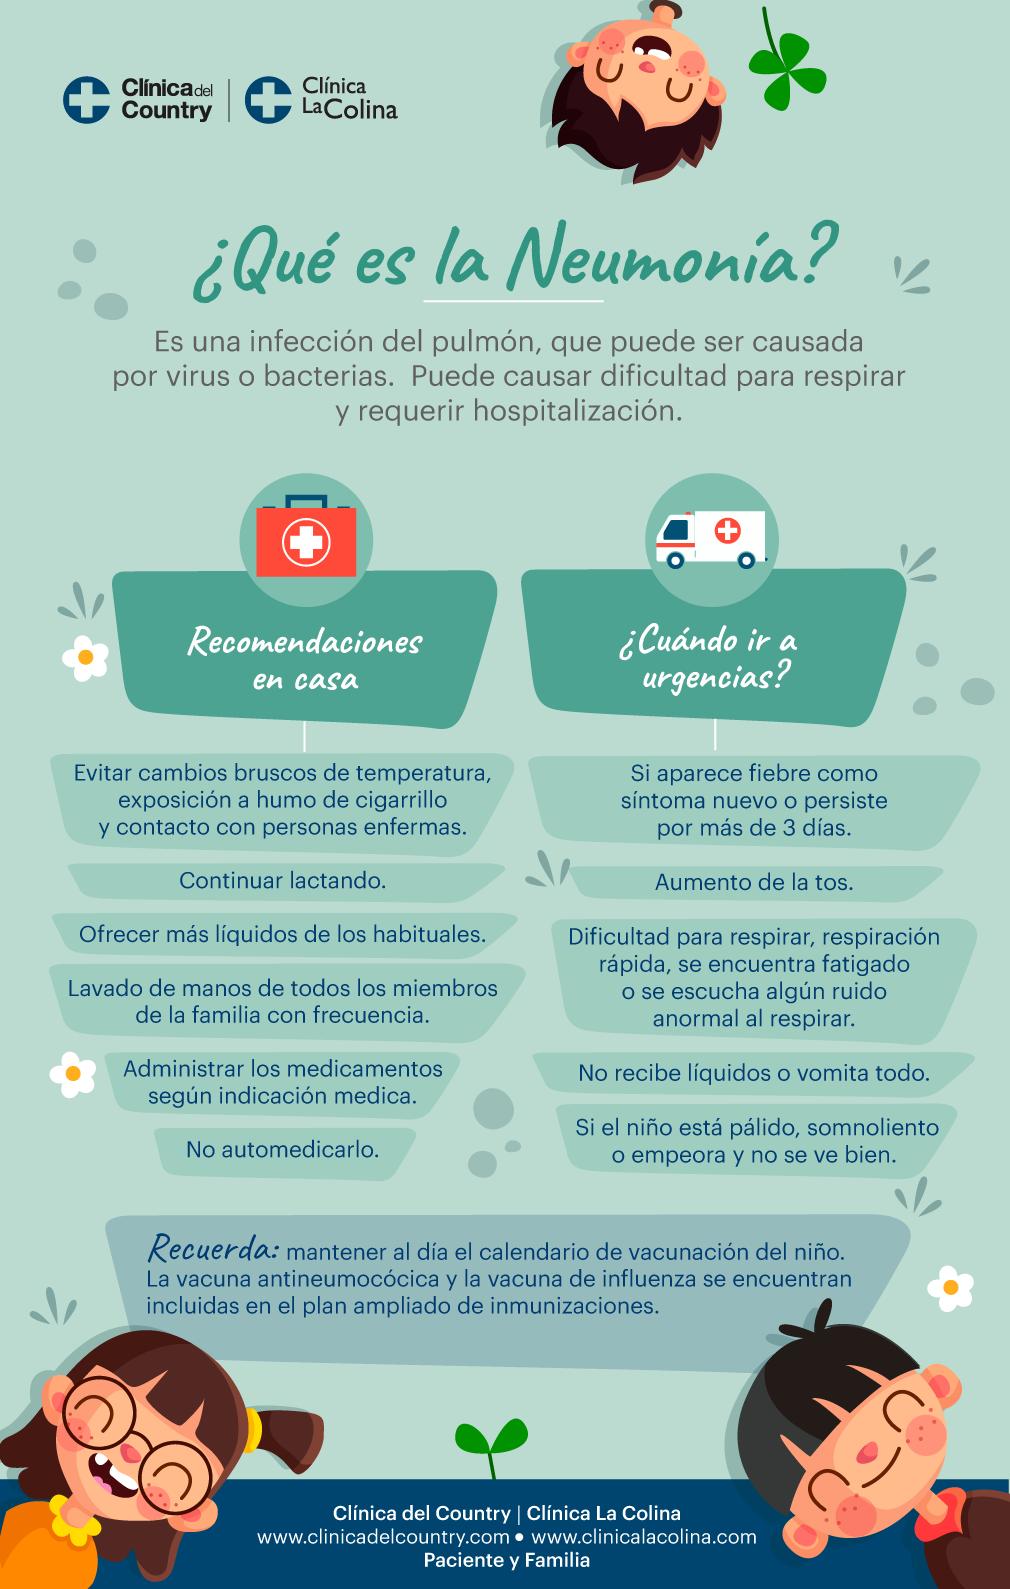 Infografia sobre la enfermedad de la neumonia